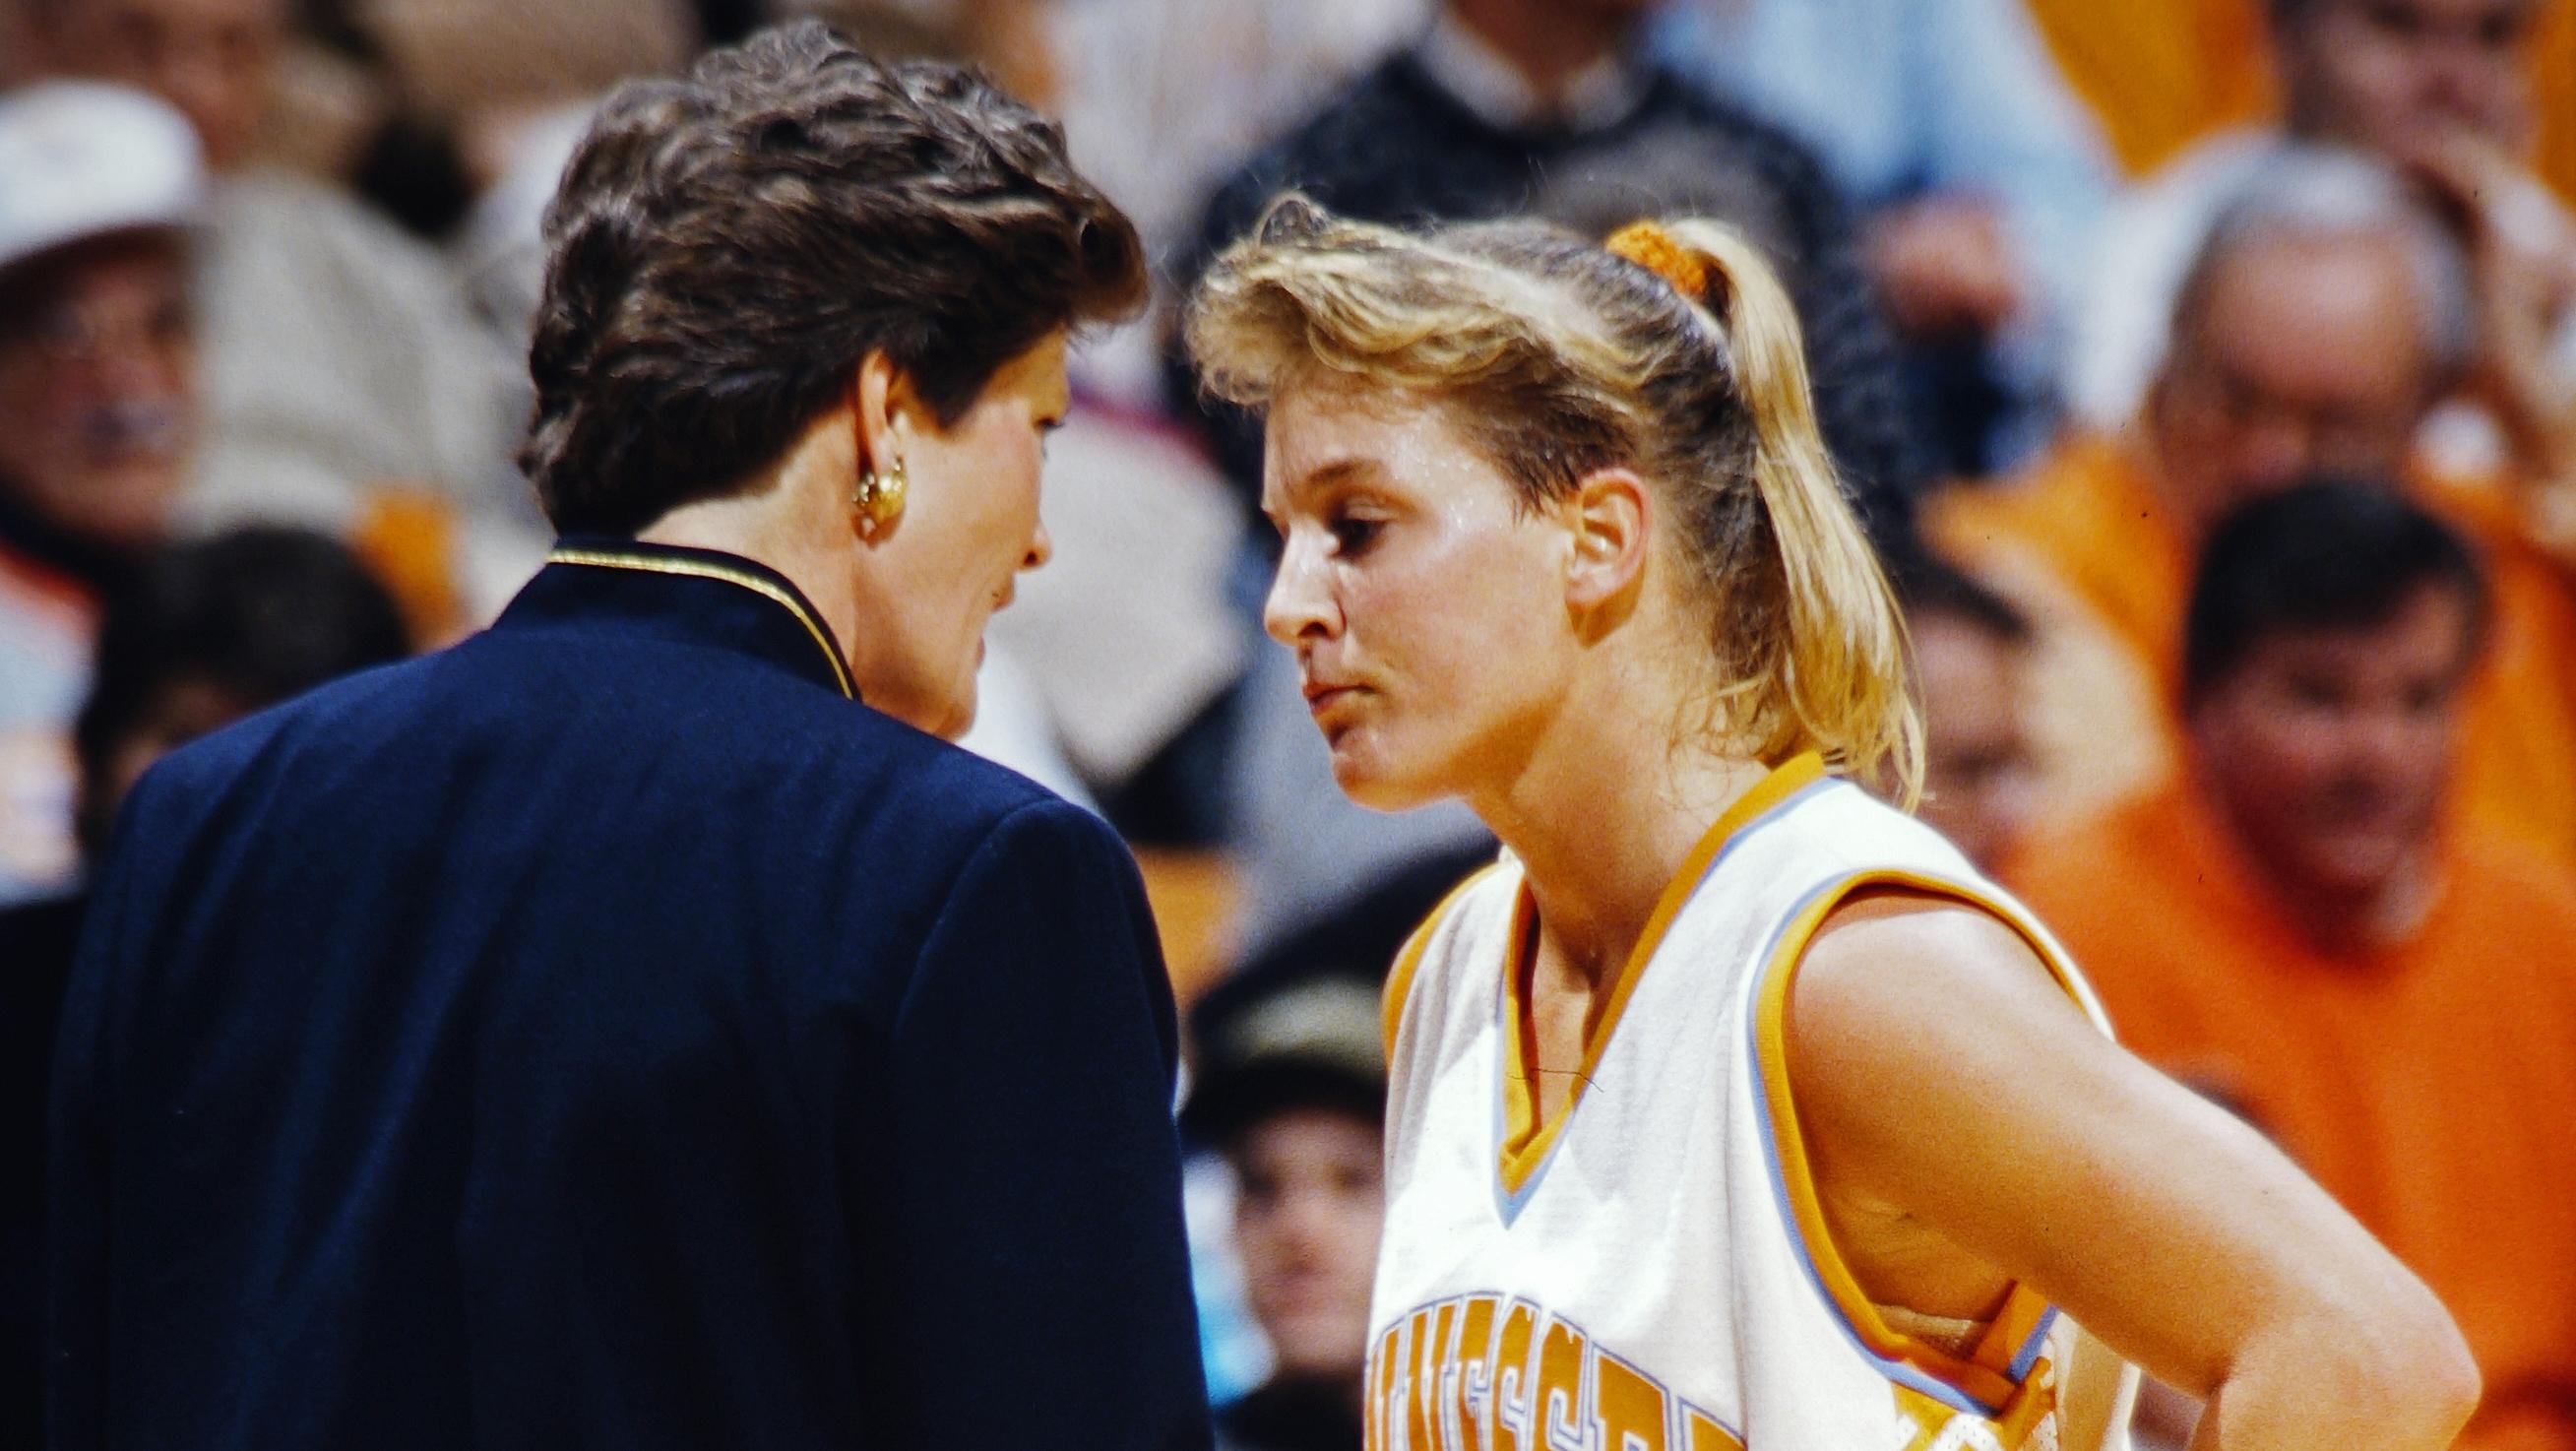 Dishin & Swishin 3/17/16 Podcast: On the 20th Anniversary, Michelle Brooke-Marciniak looks back at the 1996 Tennessee championship season